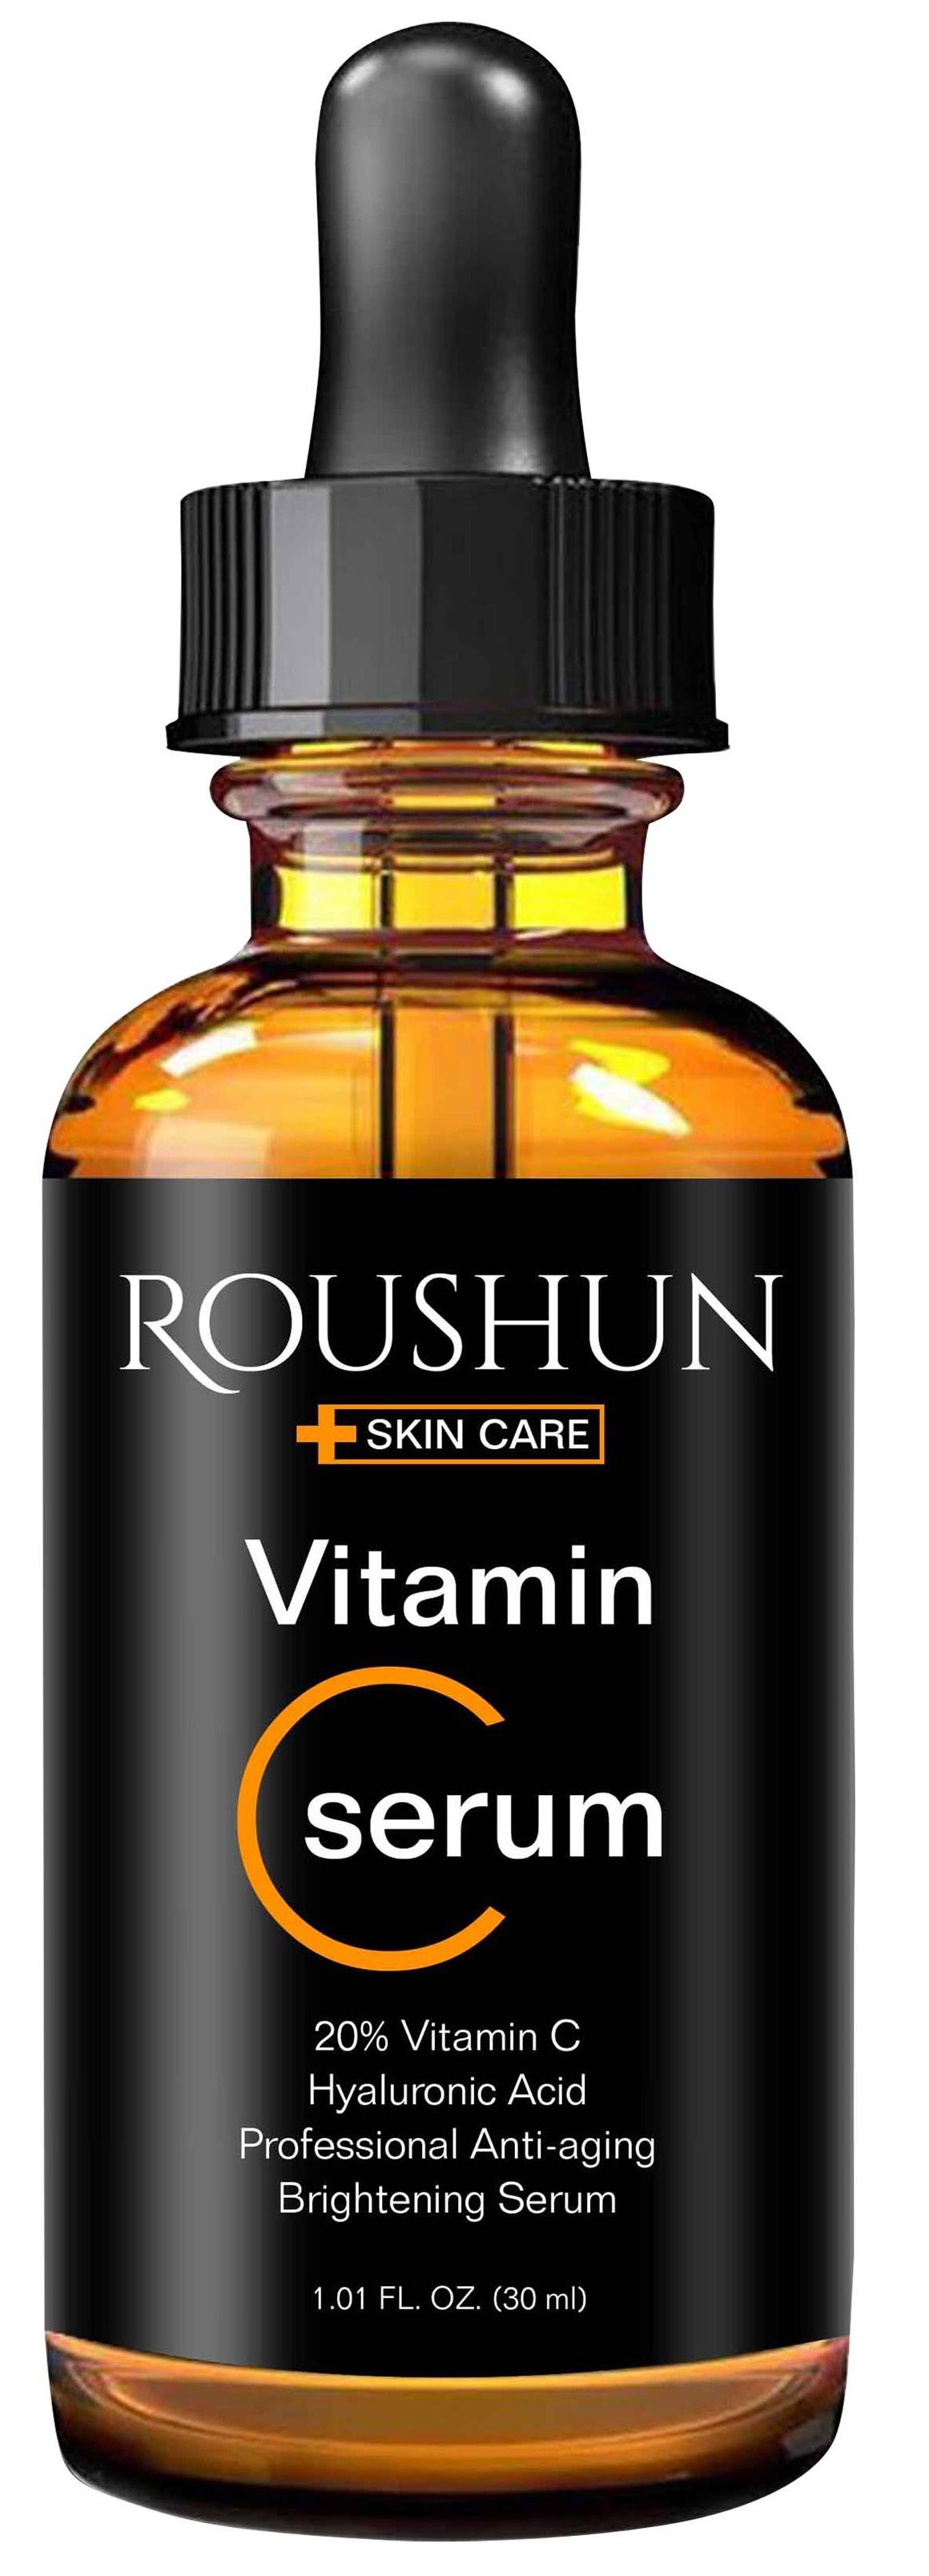 Roushun Vitamin C